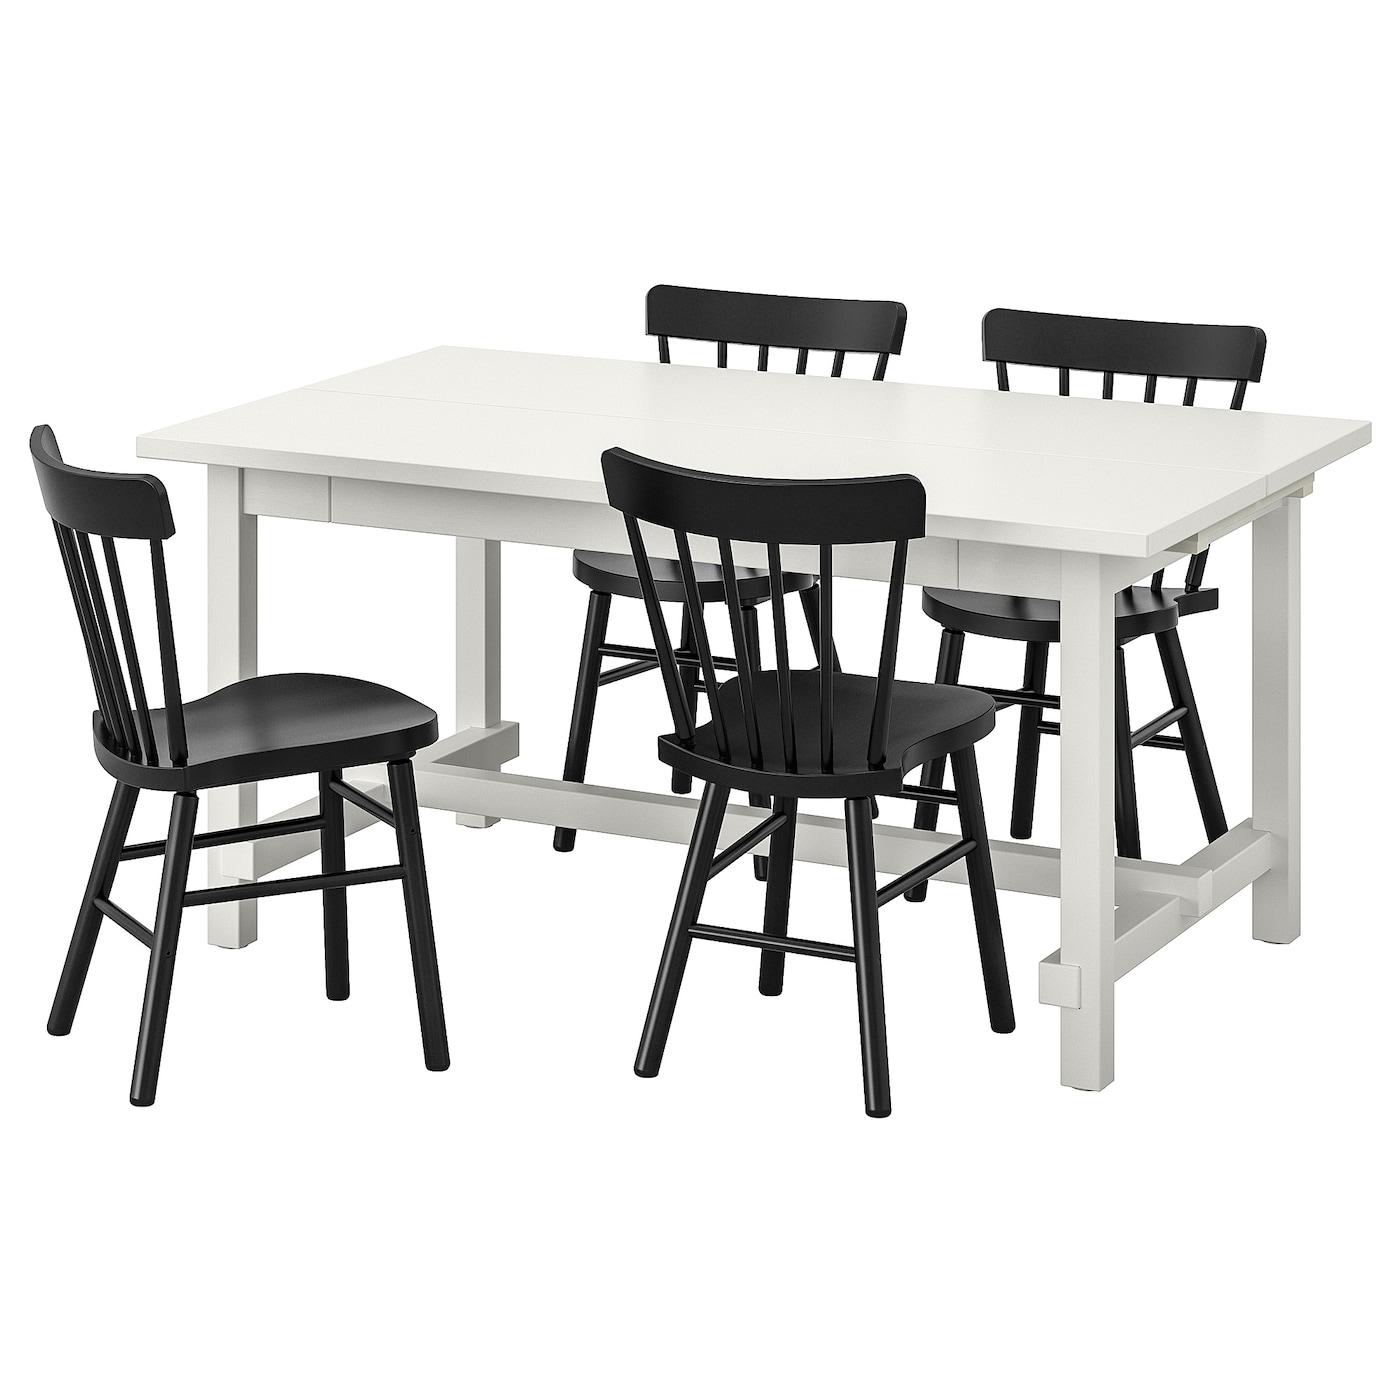 NORDVIKEN NORRARYD Tavolo e 4 sedie bianco, nero 152223x95 cm